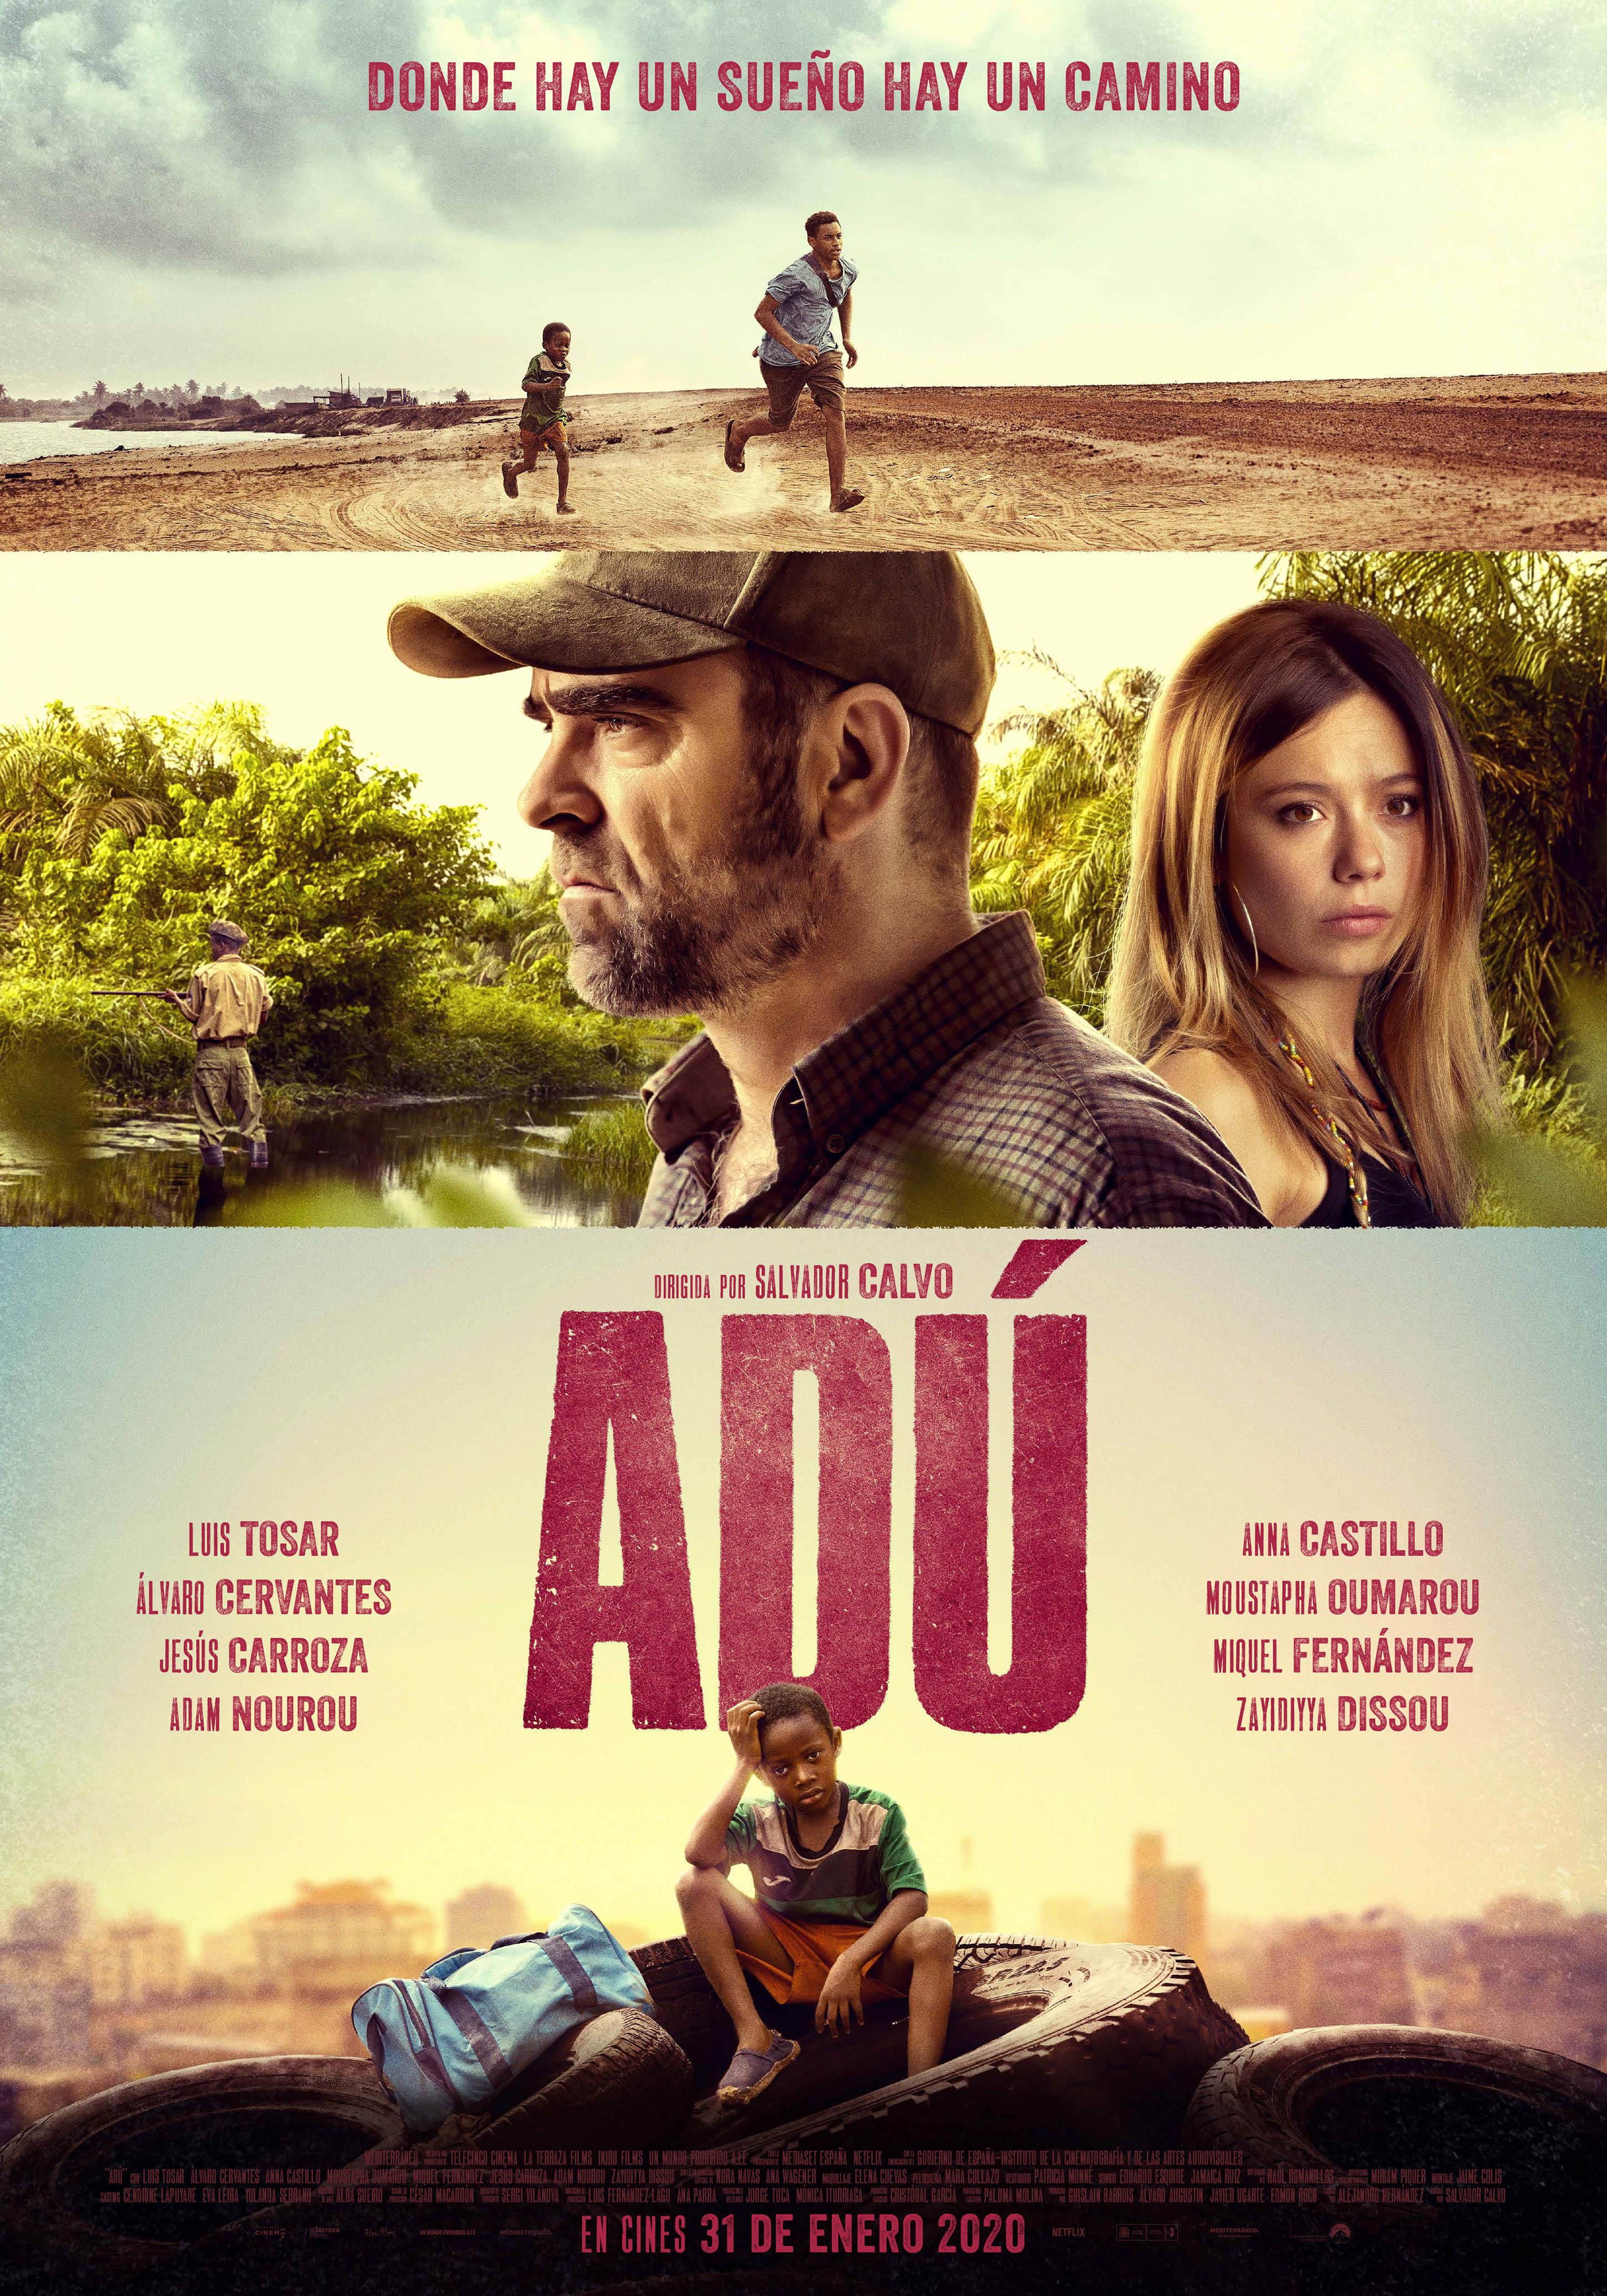 Luis Tosar and Anna Castillo in Adú (2020)